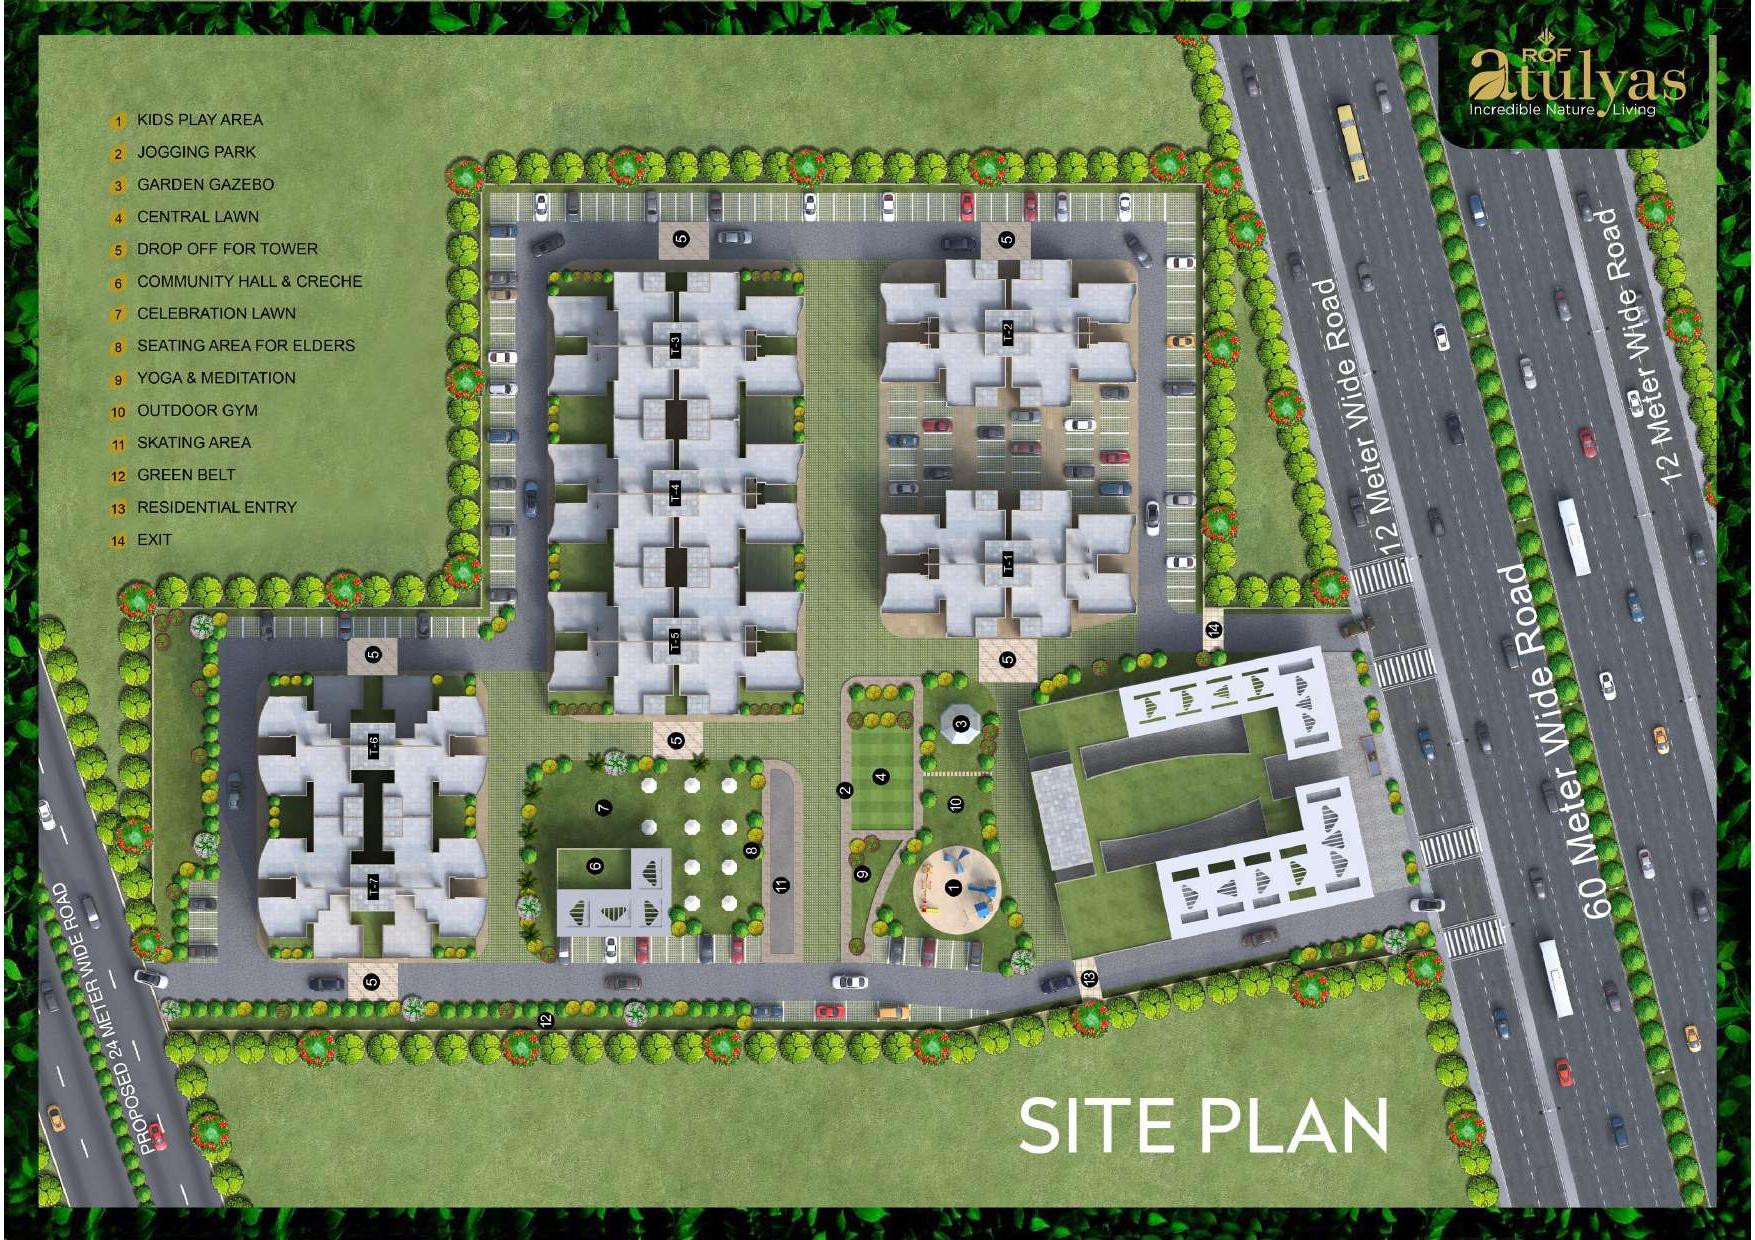 ROF Atulyas Site Plan